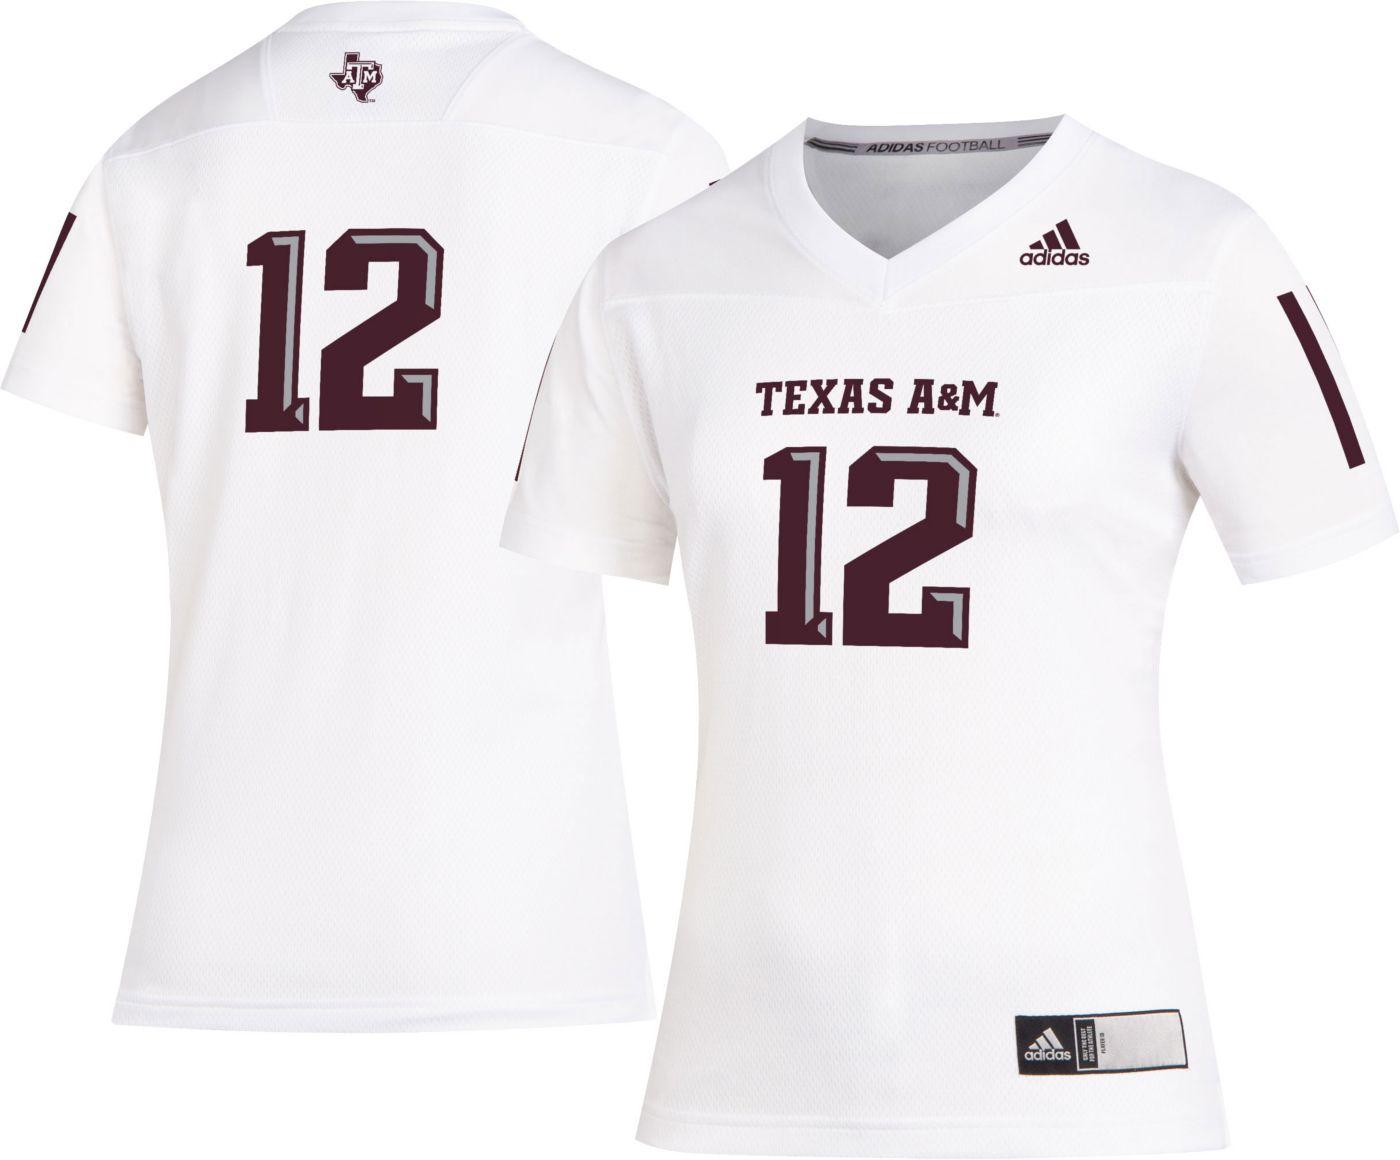 adidas Women's Texas A&M Aggies #12 Replica Football White Jersey